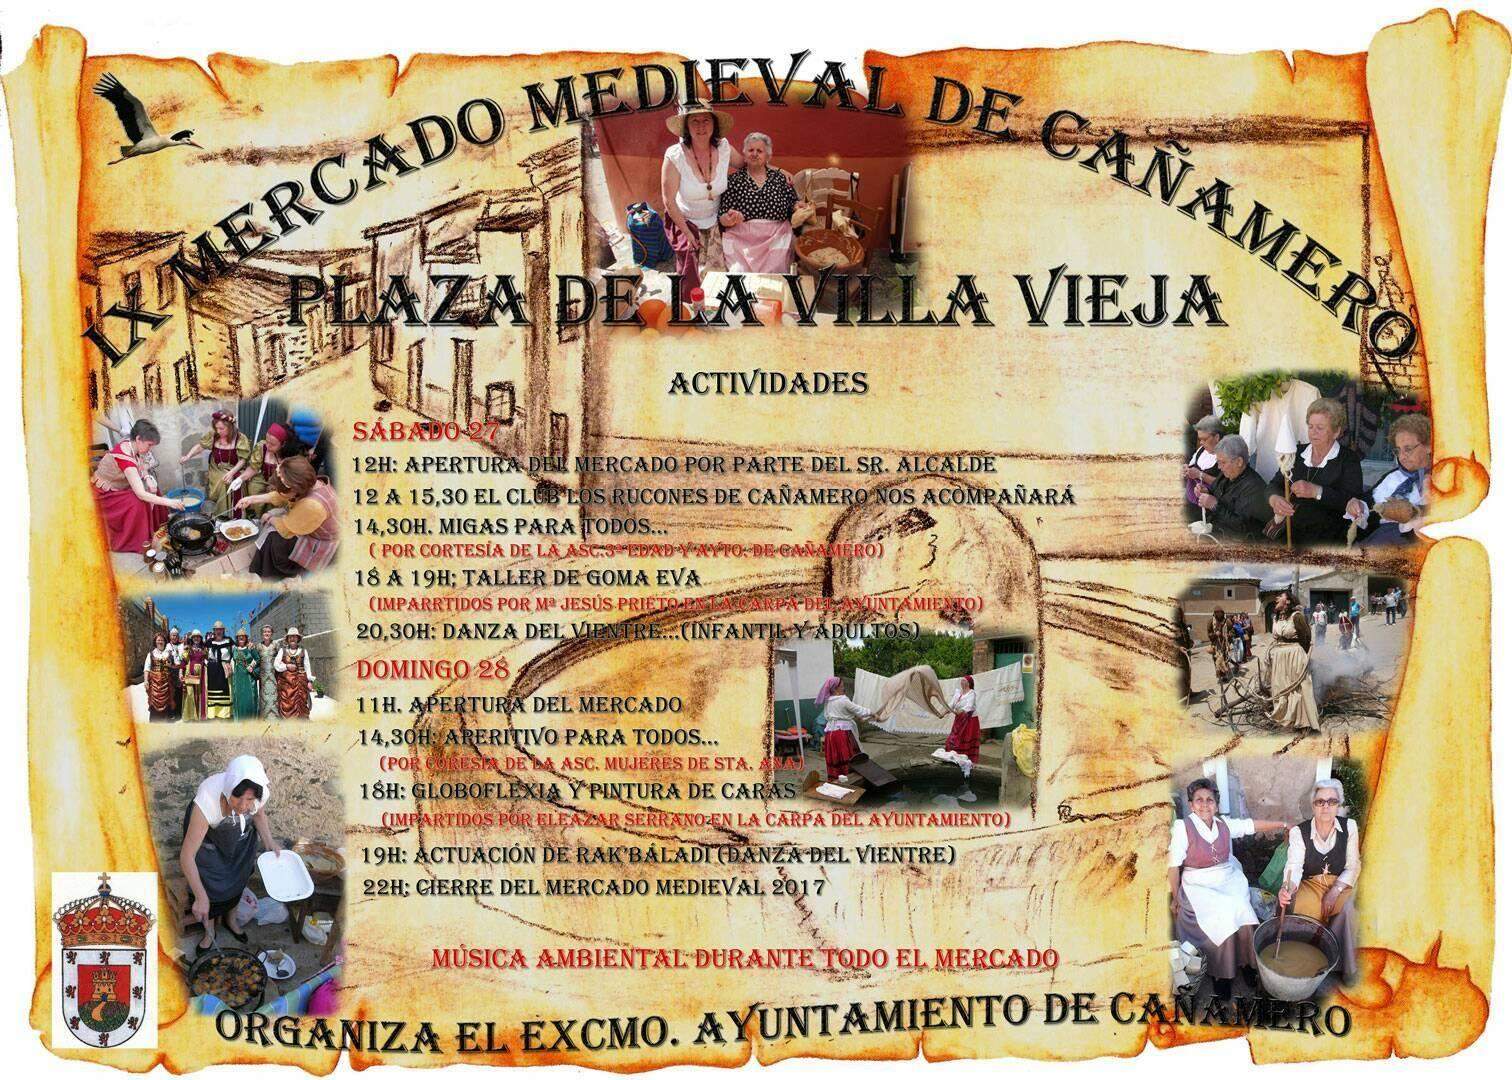 IX Mercado medieval - Cañamero